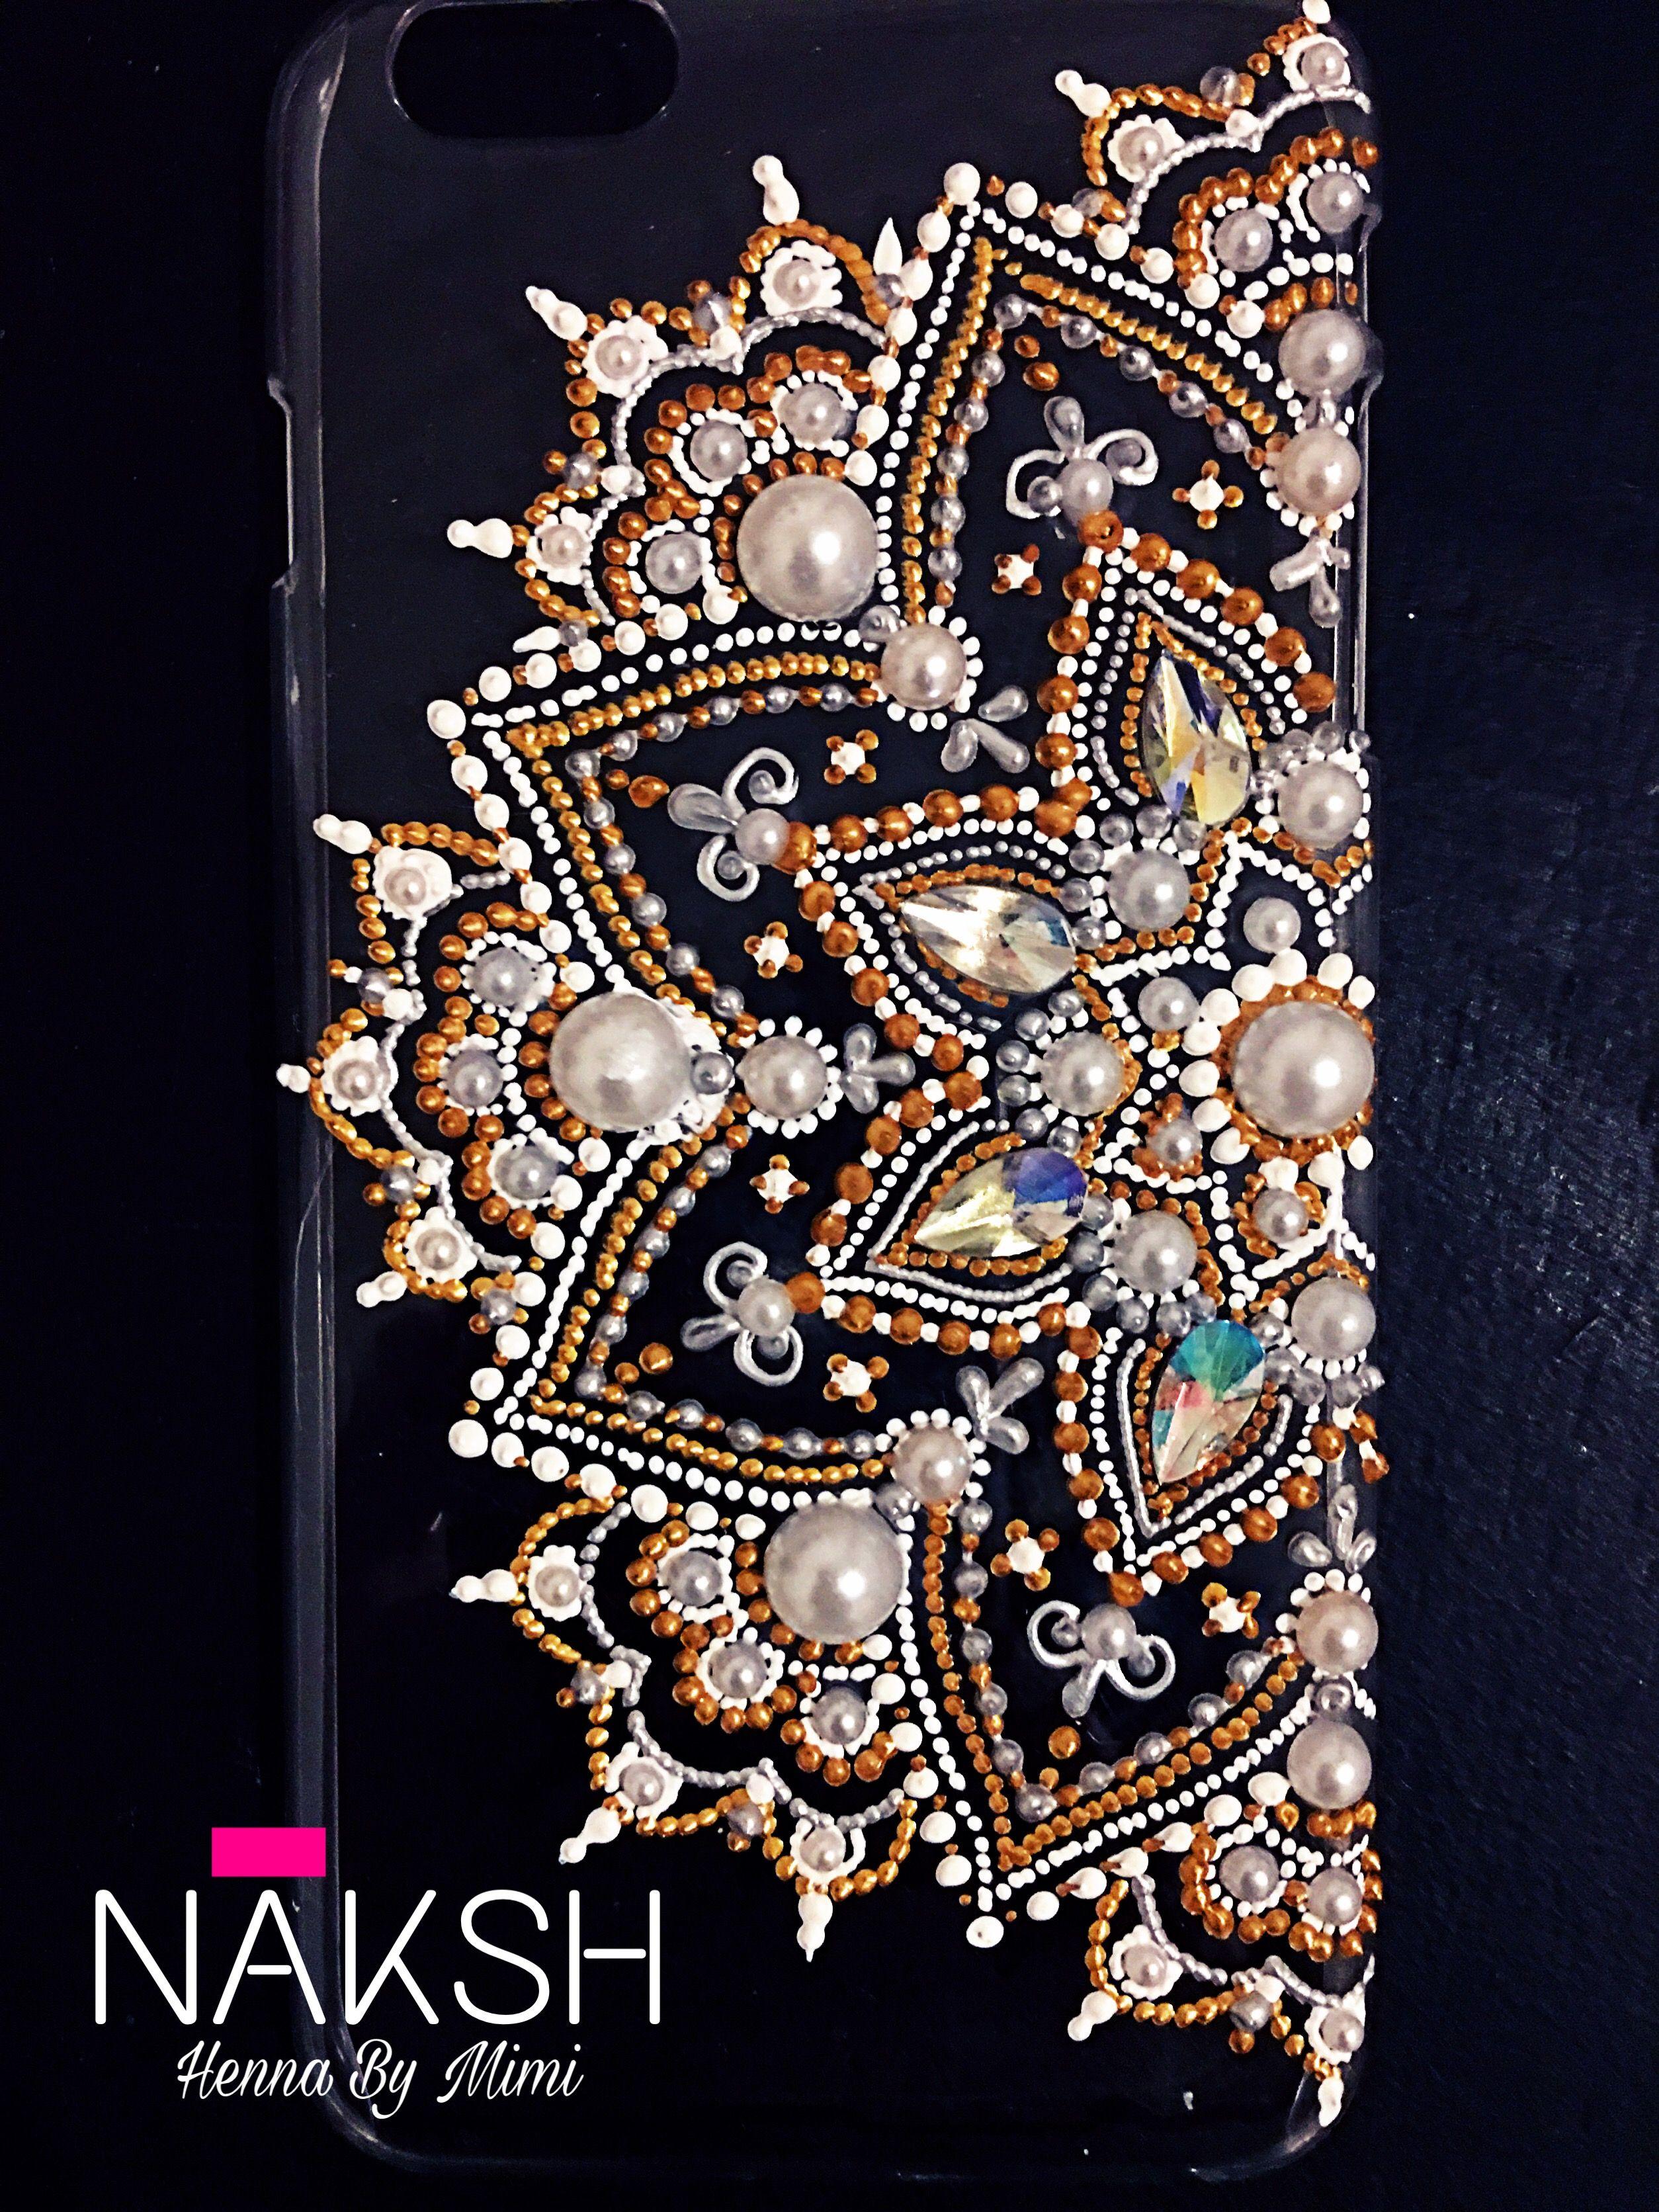 Coque iPhone 6/6s plus ..handmade | Точечные узоры ...